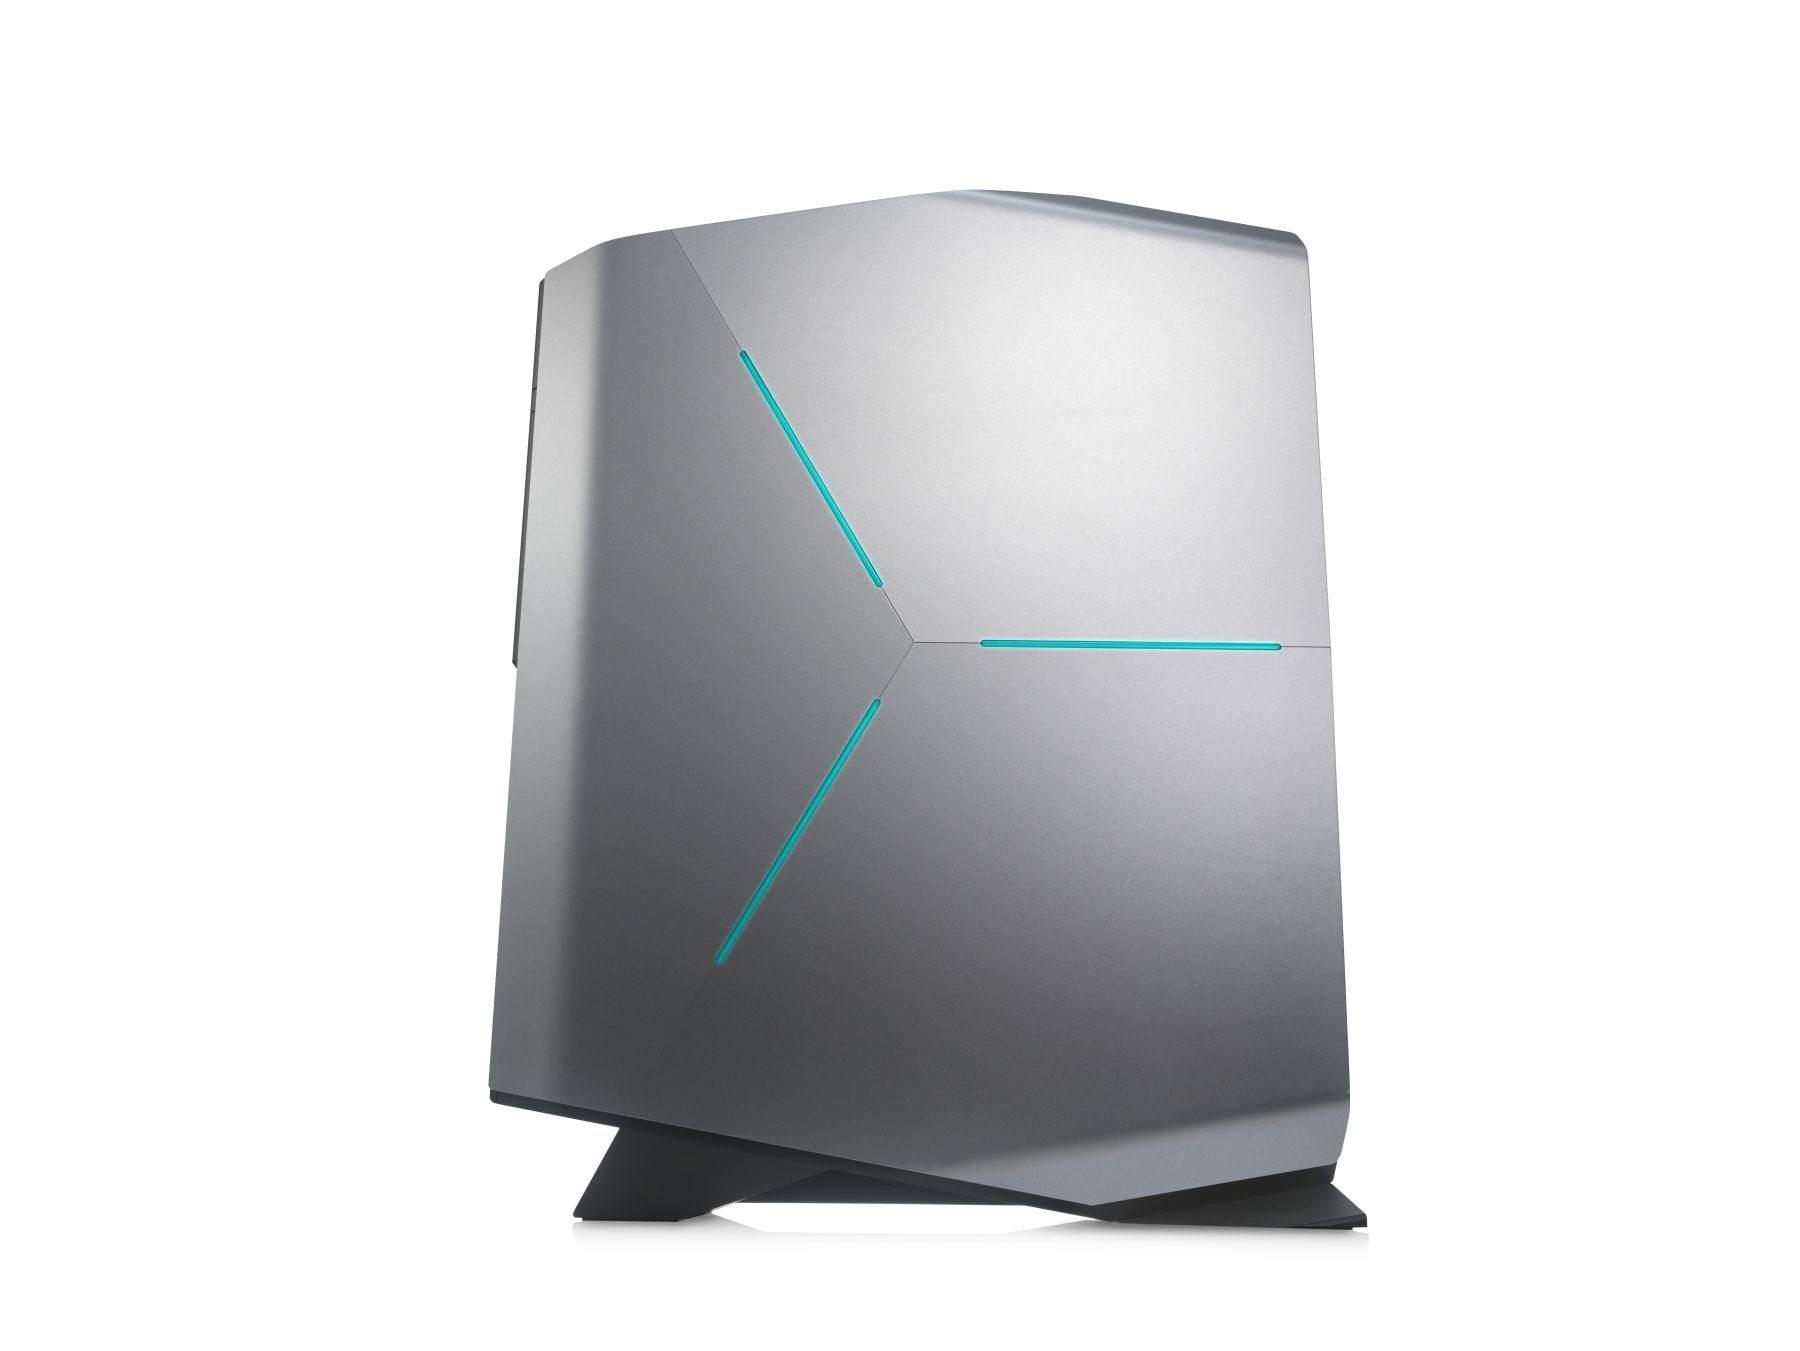 Alienware Aurora R5 desktop gaming computer, codename Shadowcat.